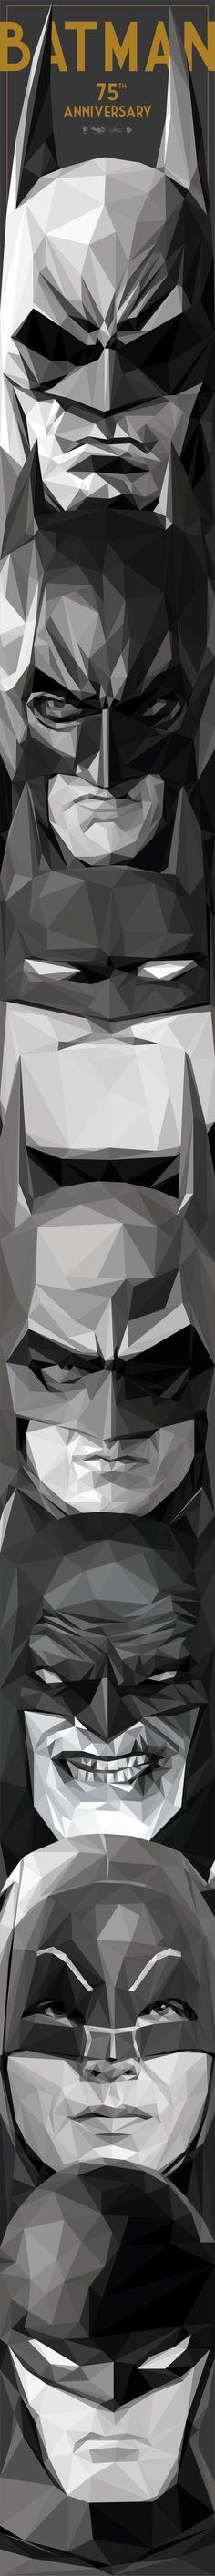 Bat-Totem by Simon Delart